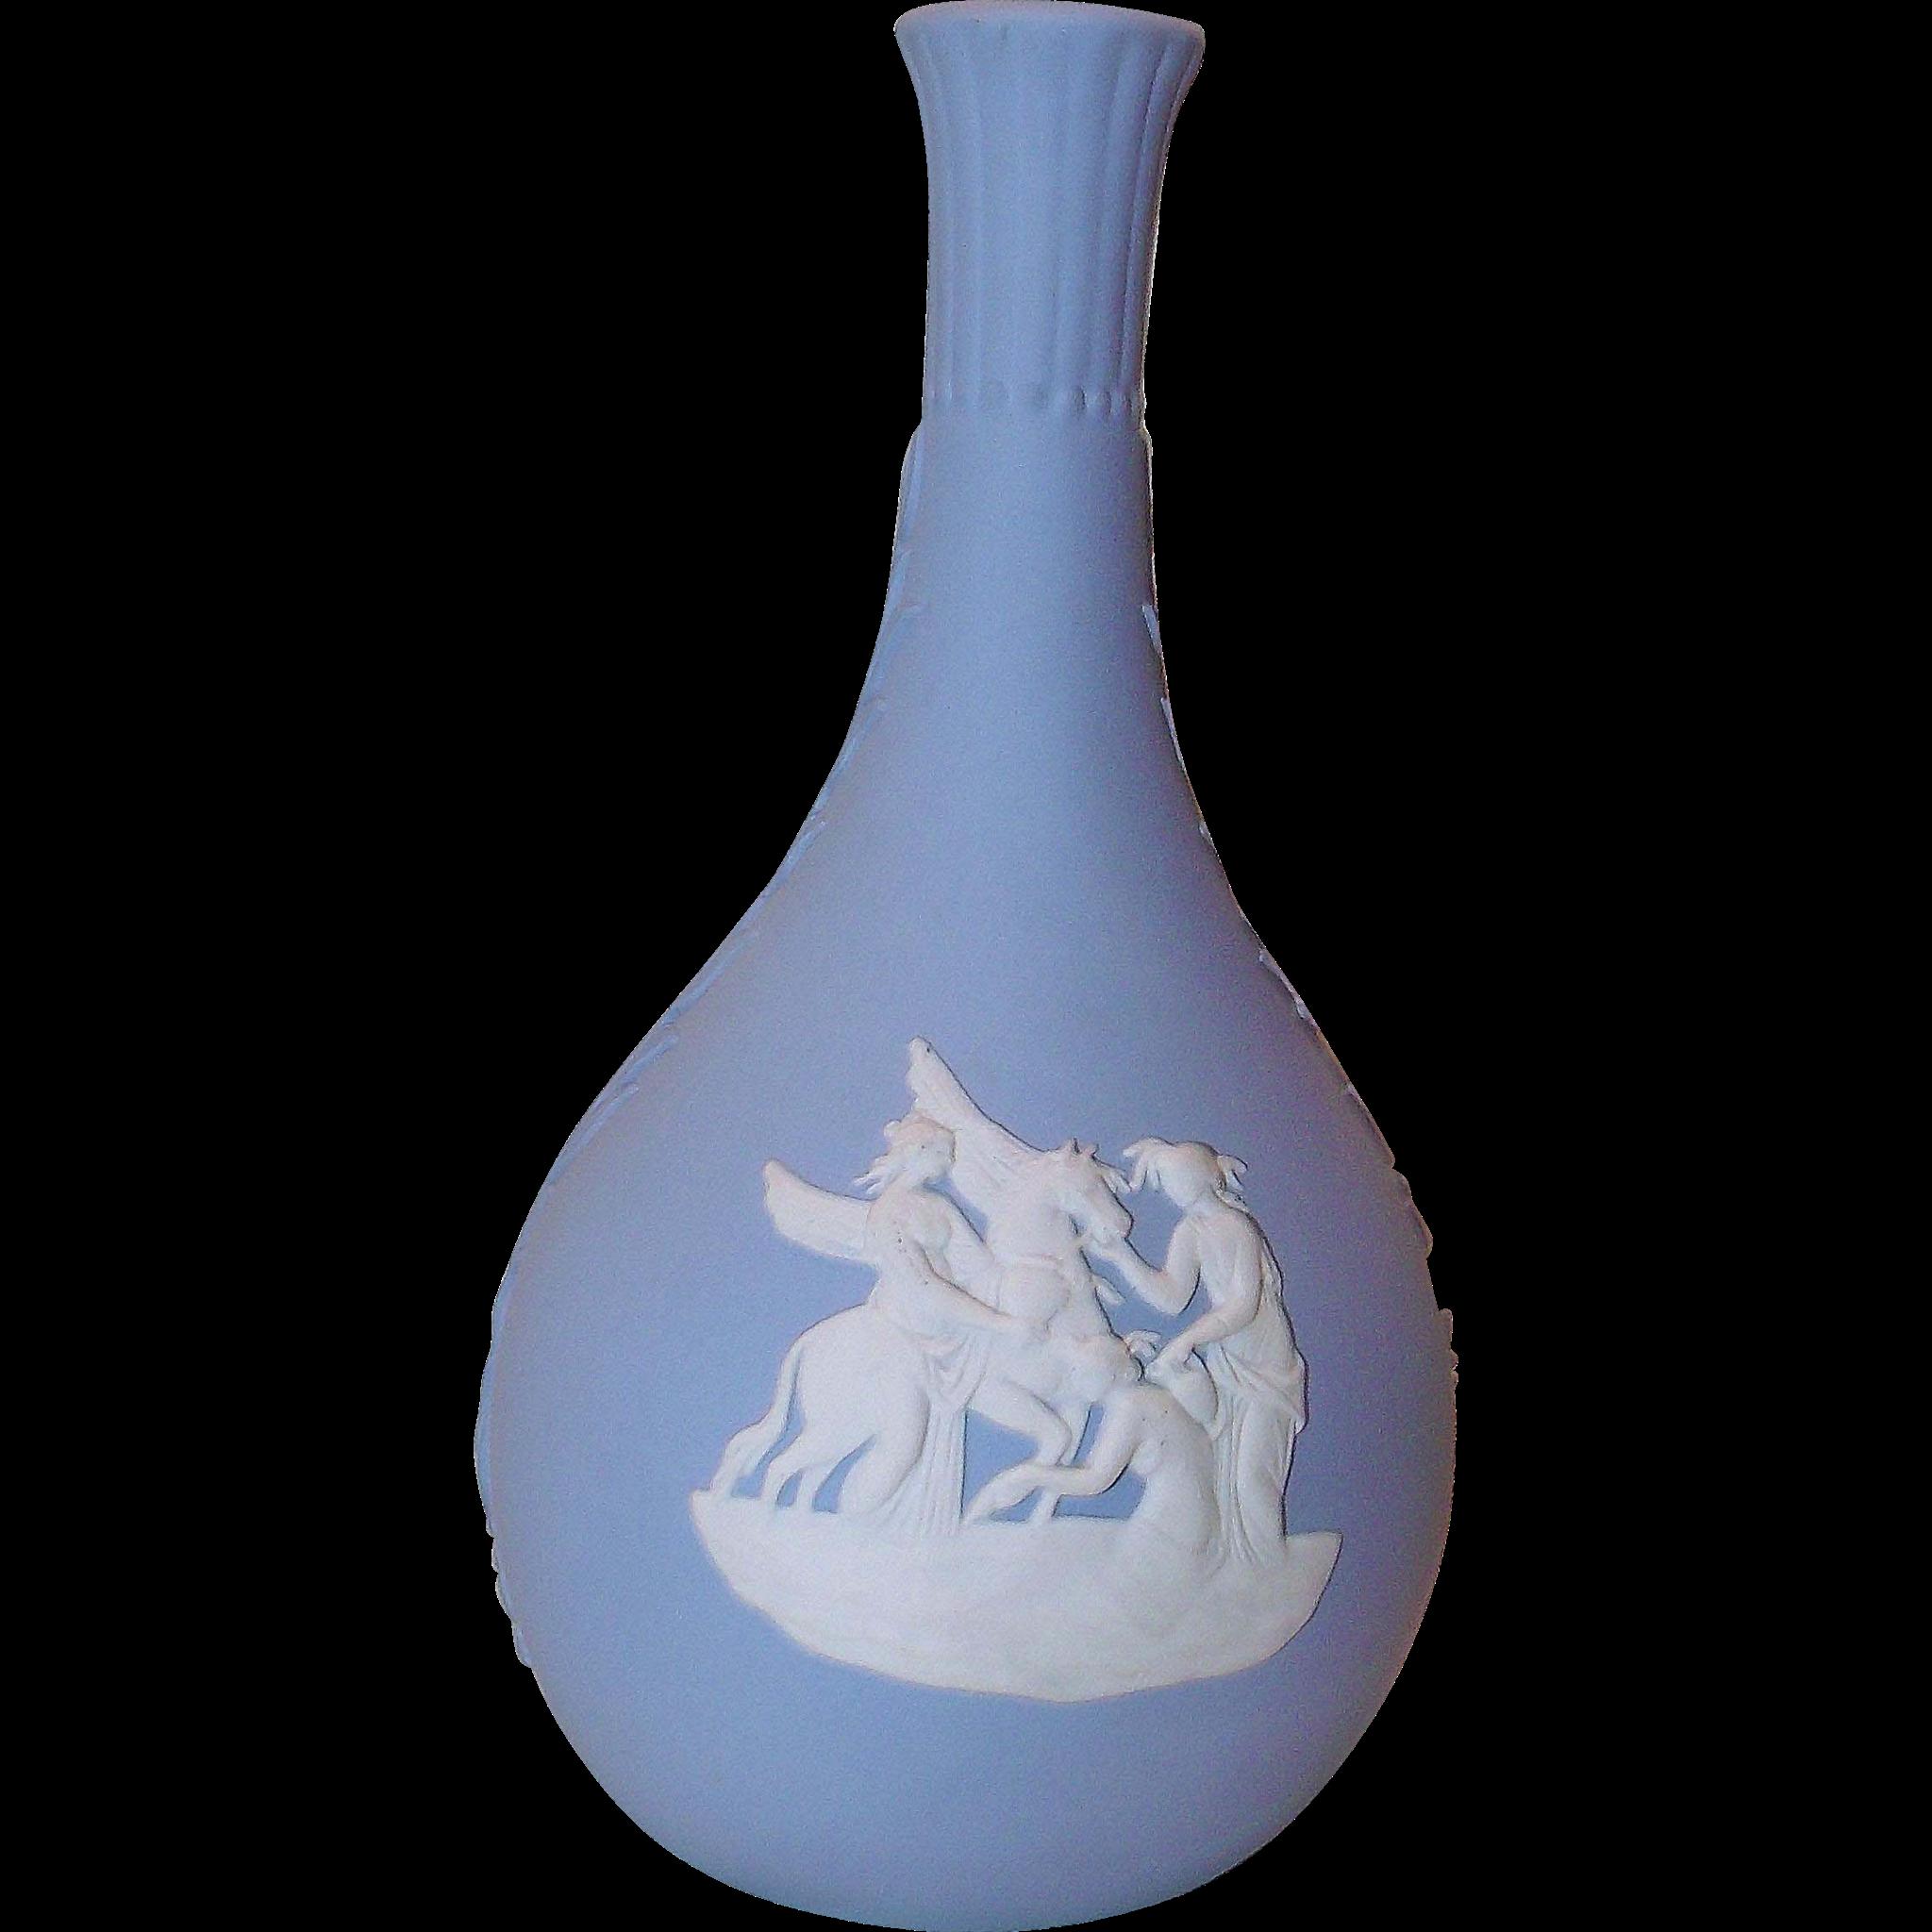 Blue Bud Vase Wedgwood Jasperware w/ Pegasus